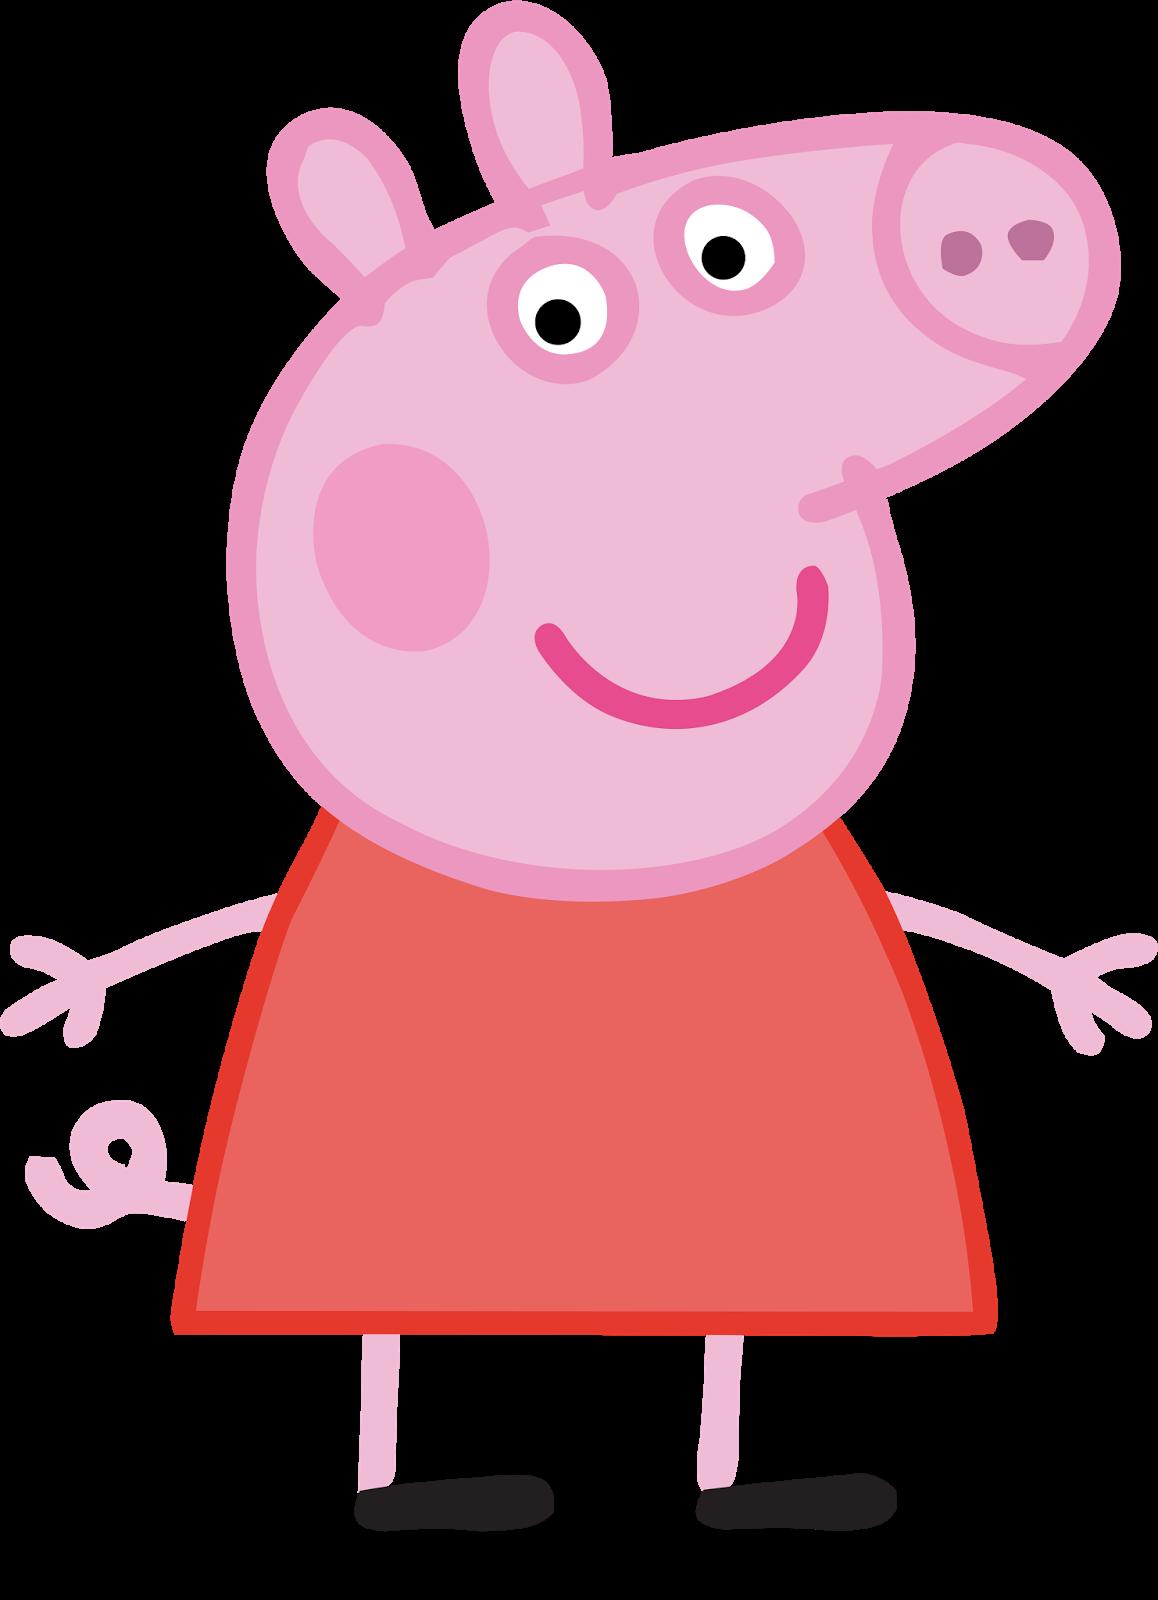 Cartoon Characters Peppa Pig PNG (HQ) Peppa pig, Peppa